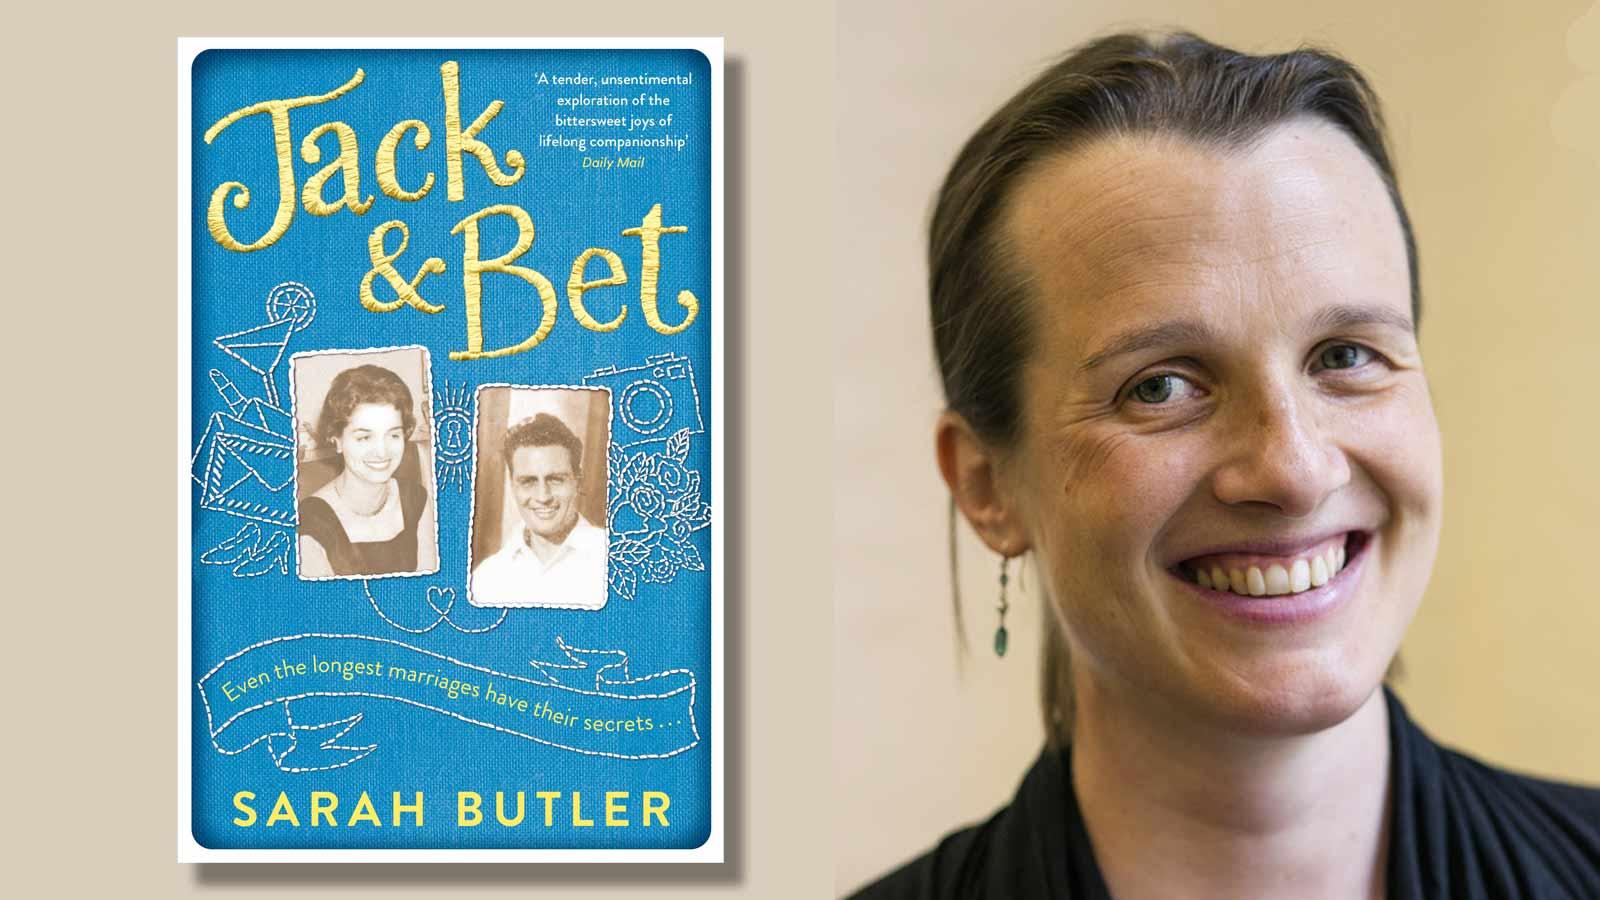 Jack & Bet book cover and Sarah Butler